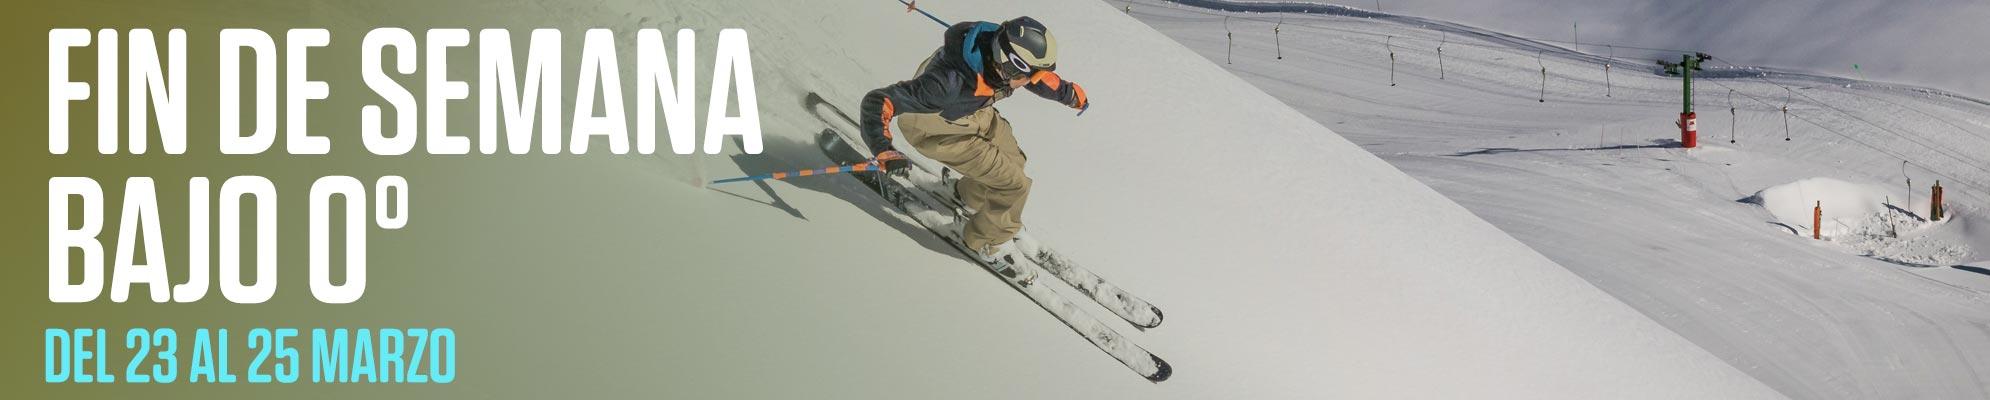 oferta esqui fin de semana bajo cero aramon formigal panticosa cerler